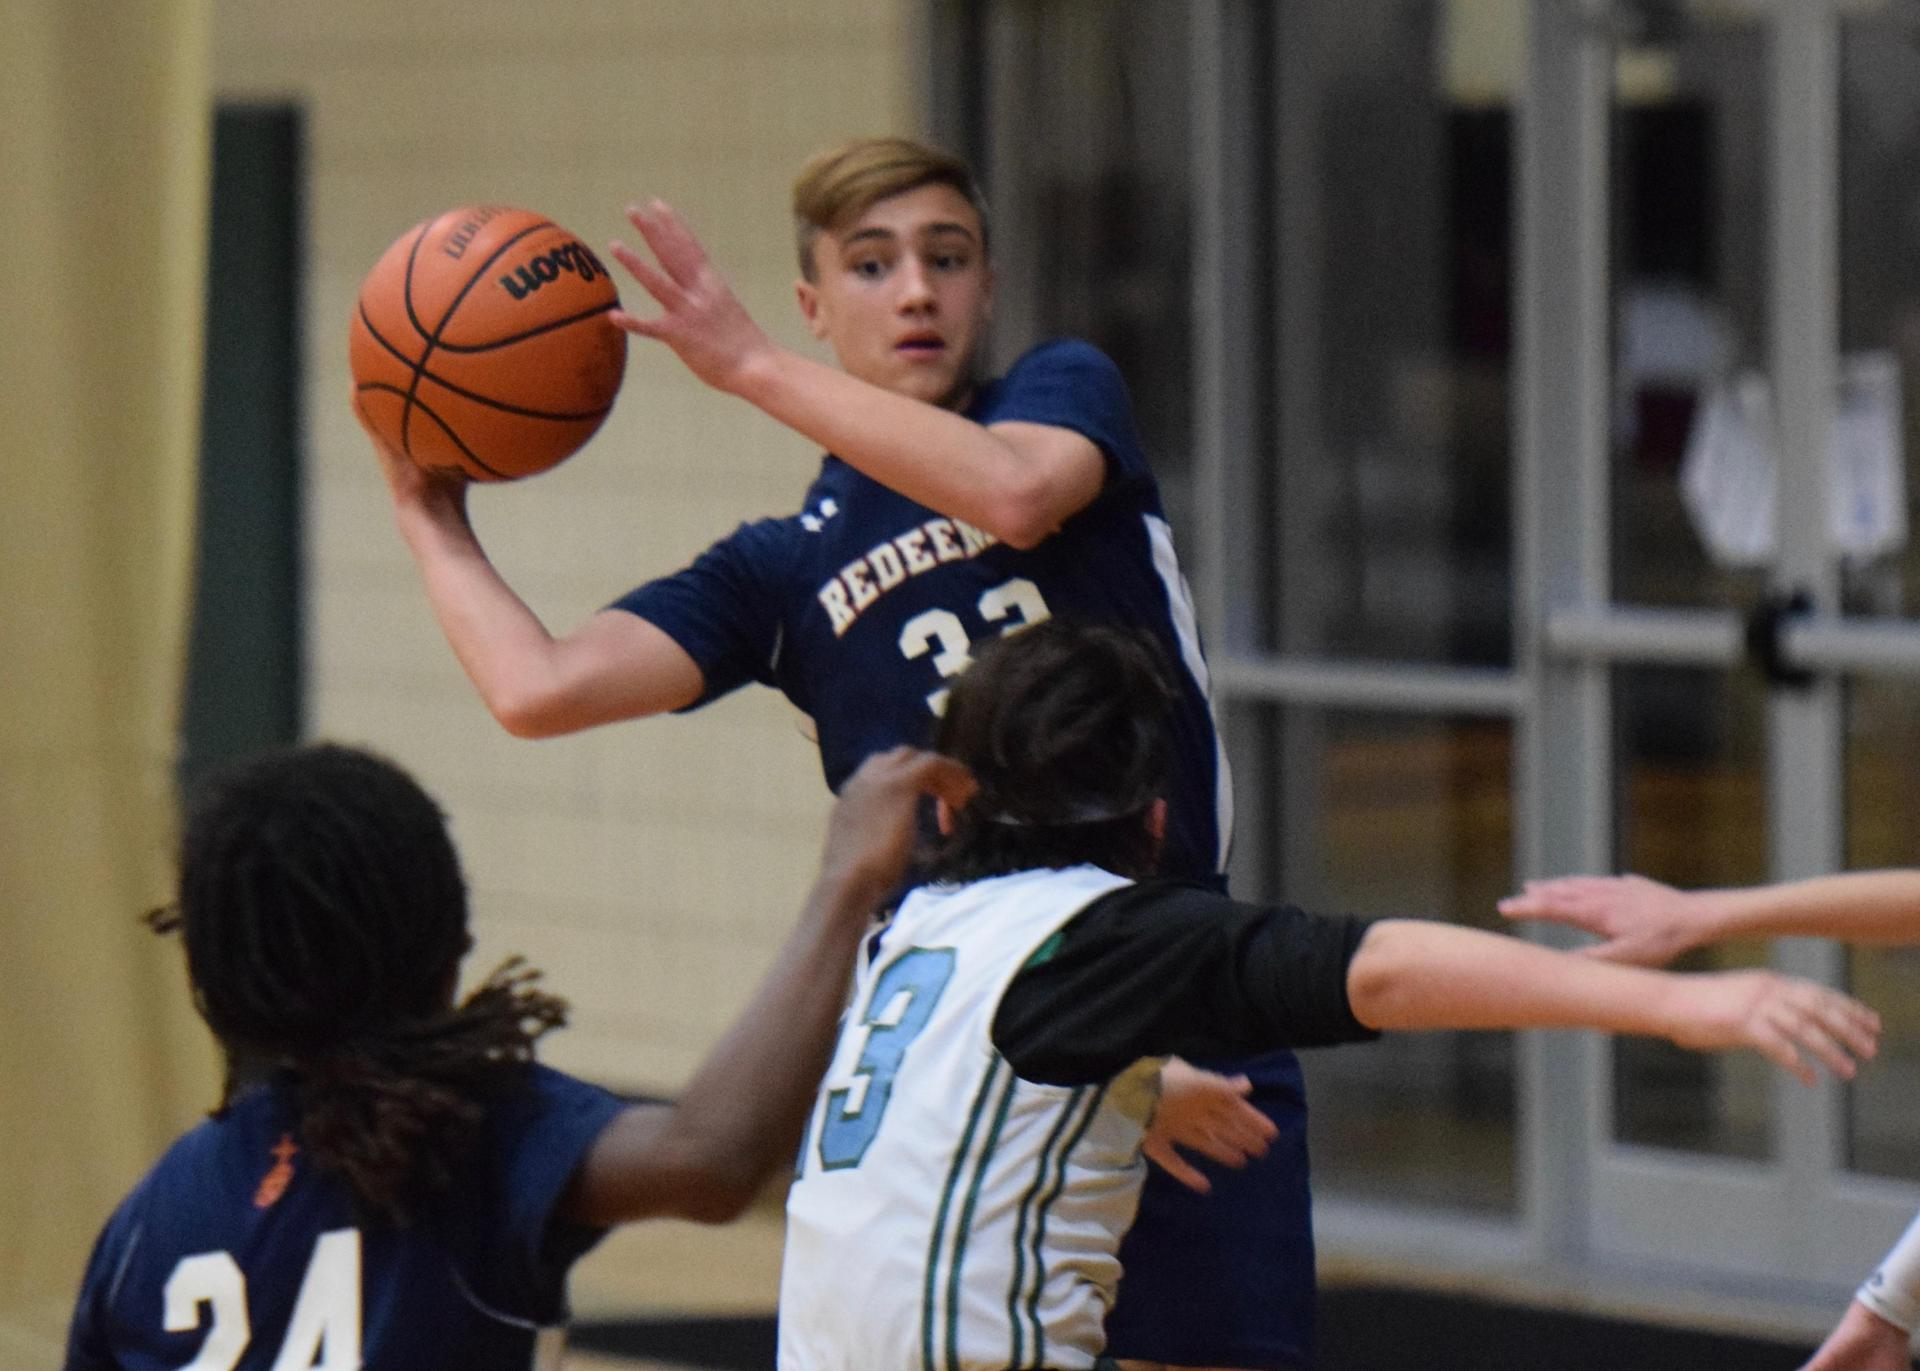 Middle school boy playing basketball